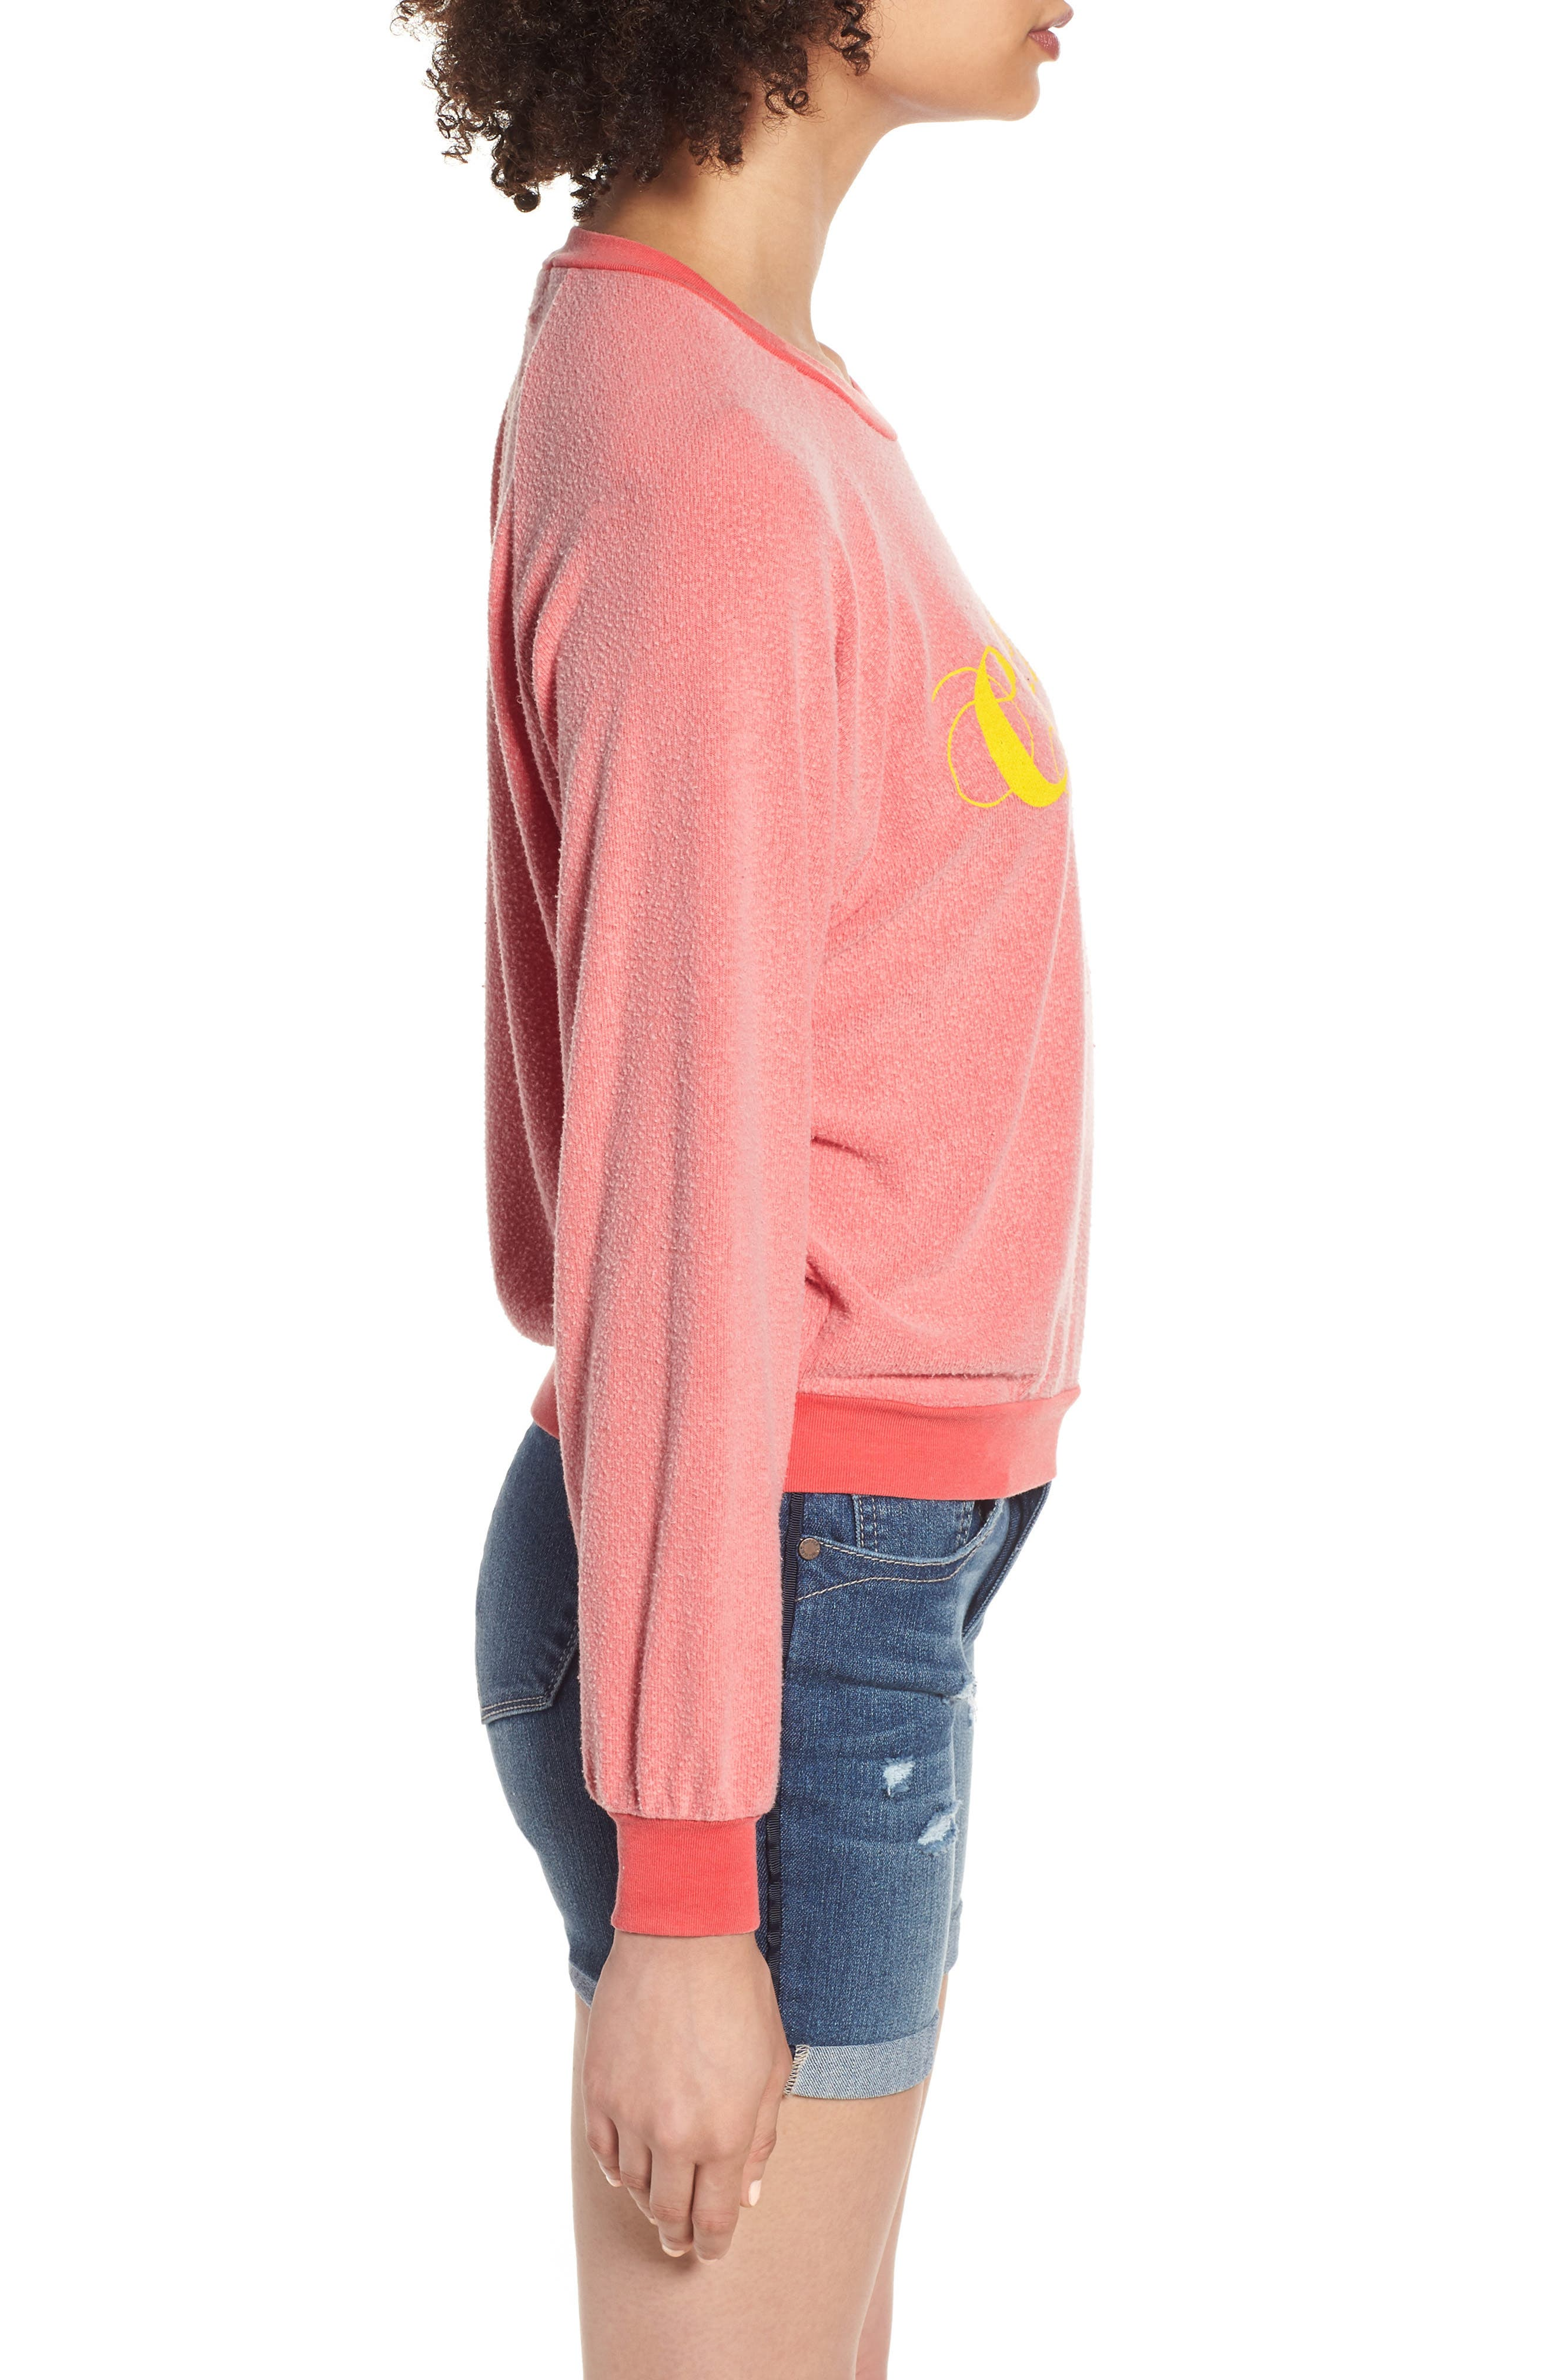 Caliente Junior Sweatshirt,                             Alternate thumbnail 3, color,                             Pigment Hot Lipstick